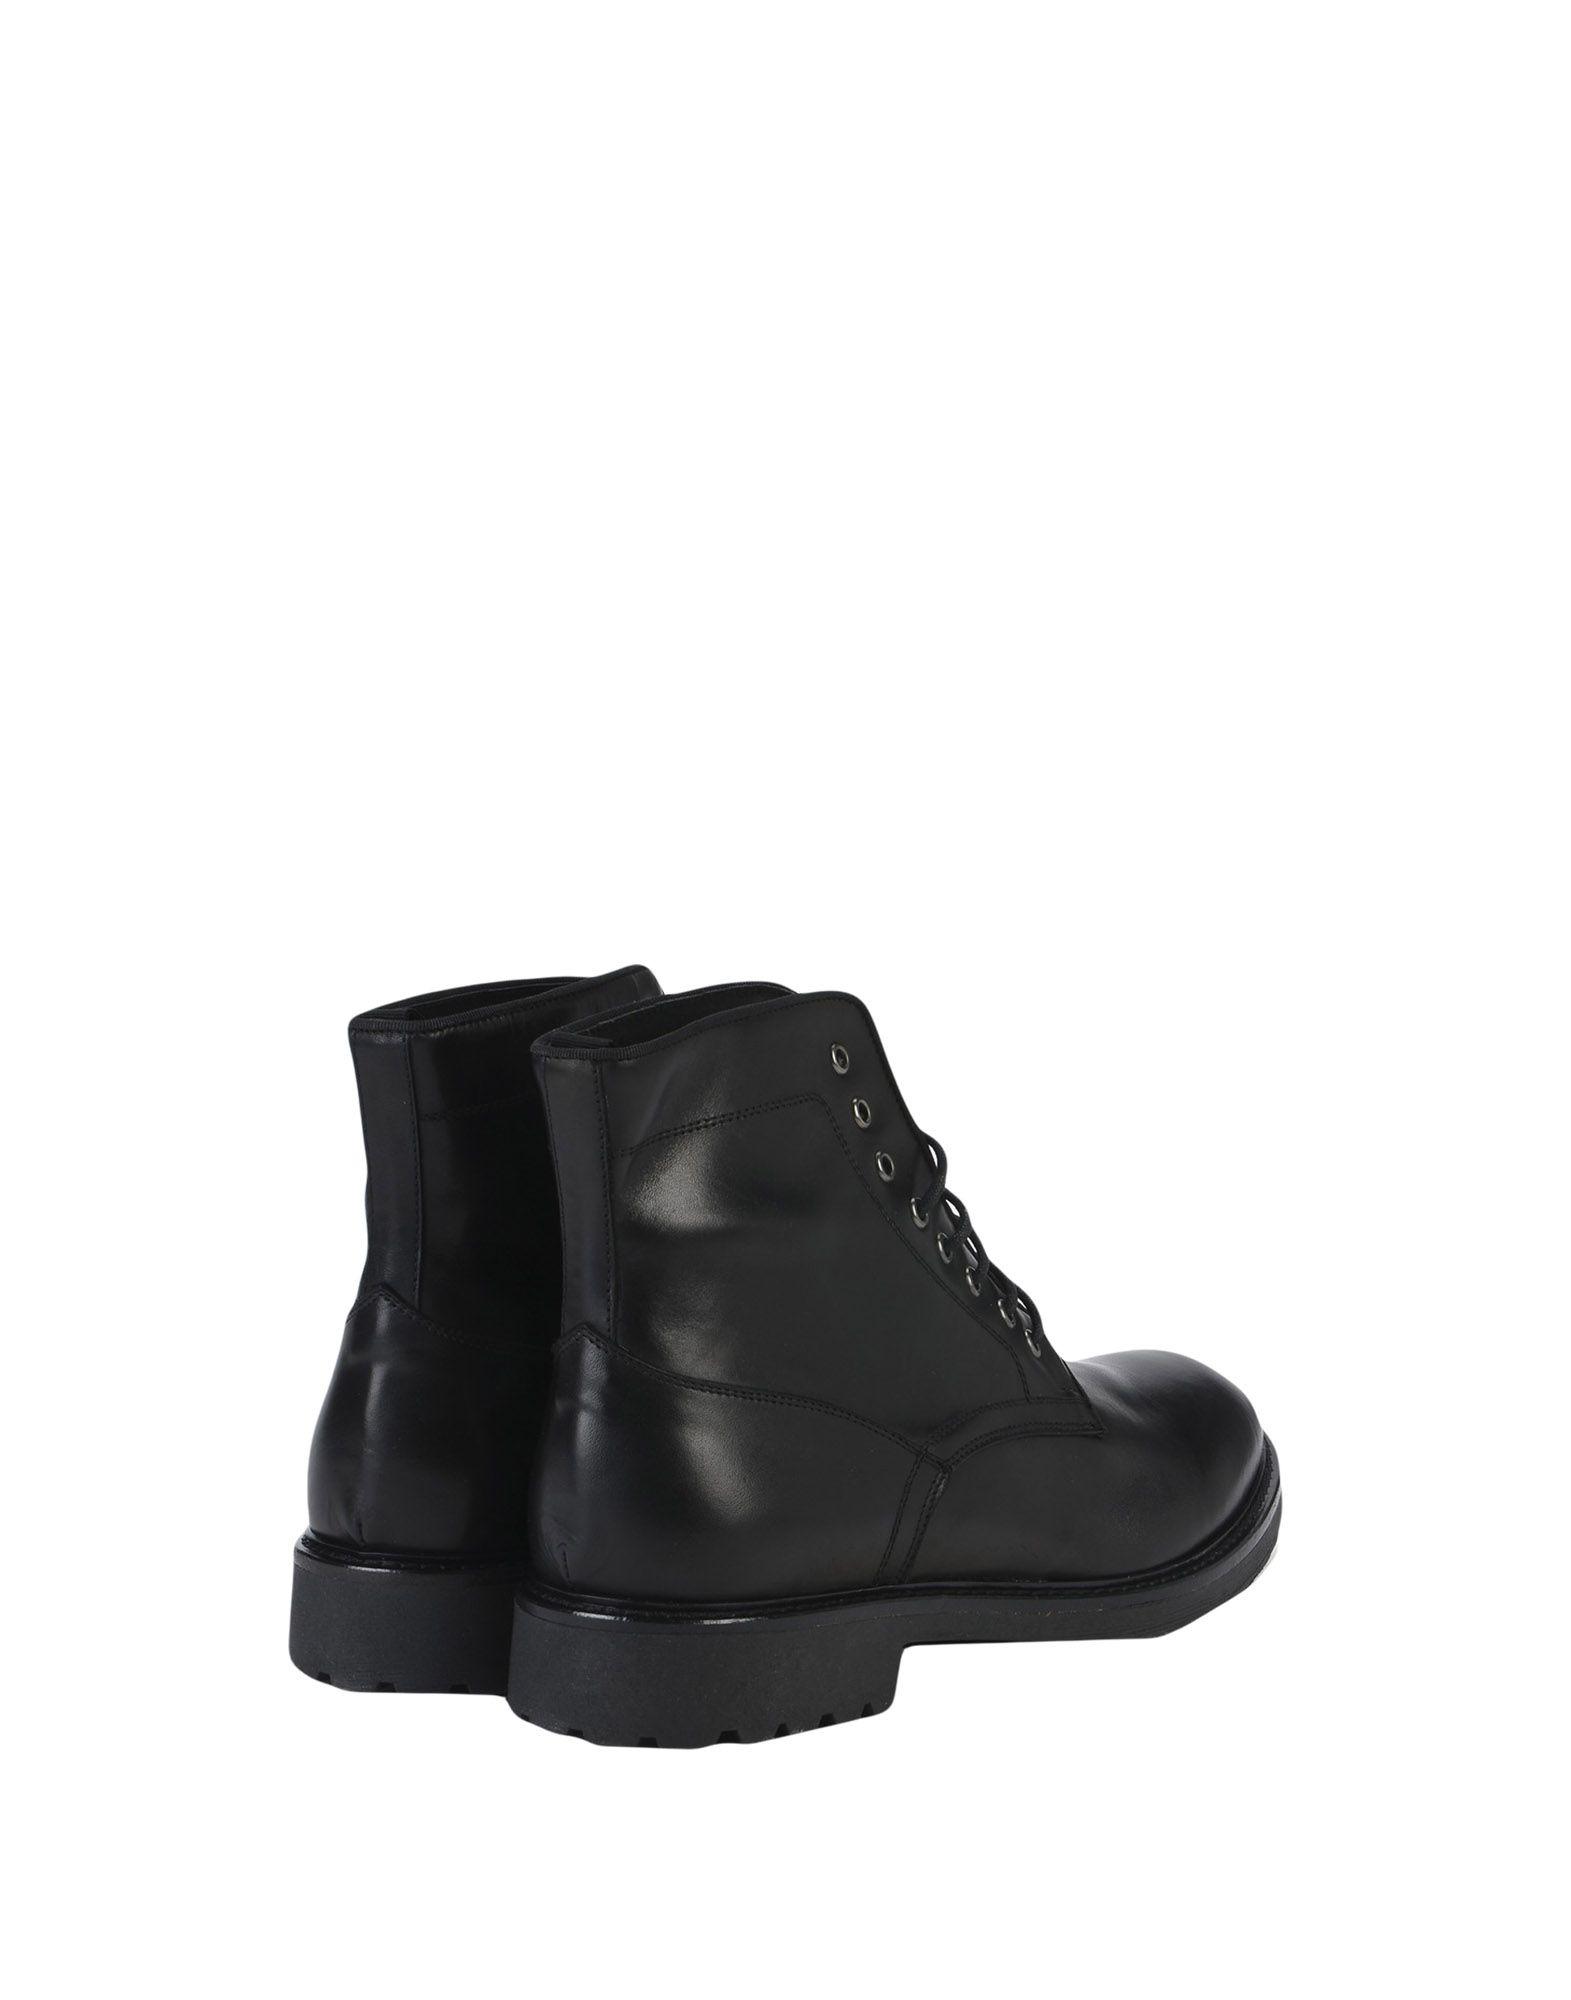 Doubles 4 You® Boots - Men Men Men Doubles 4 You® Boots online on  Australia - 11512564WD 08dadb